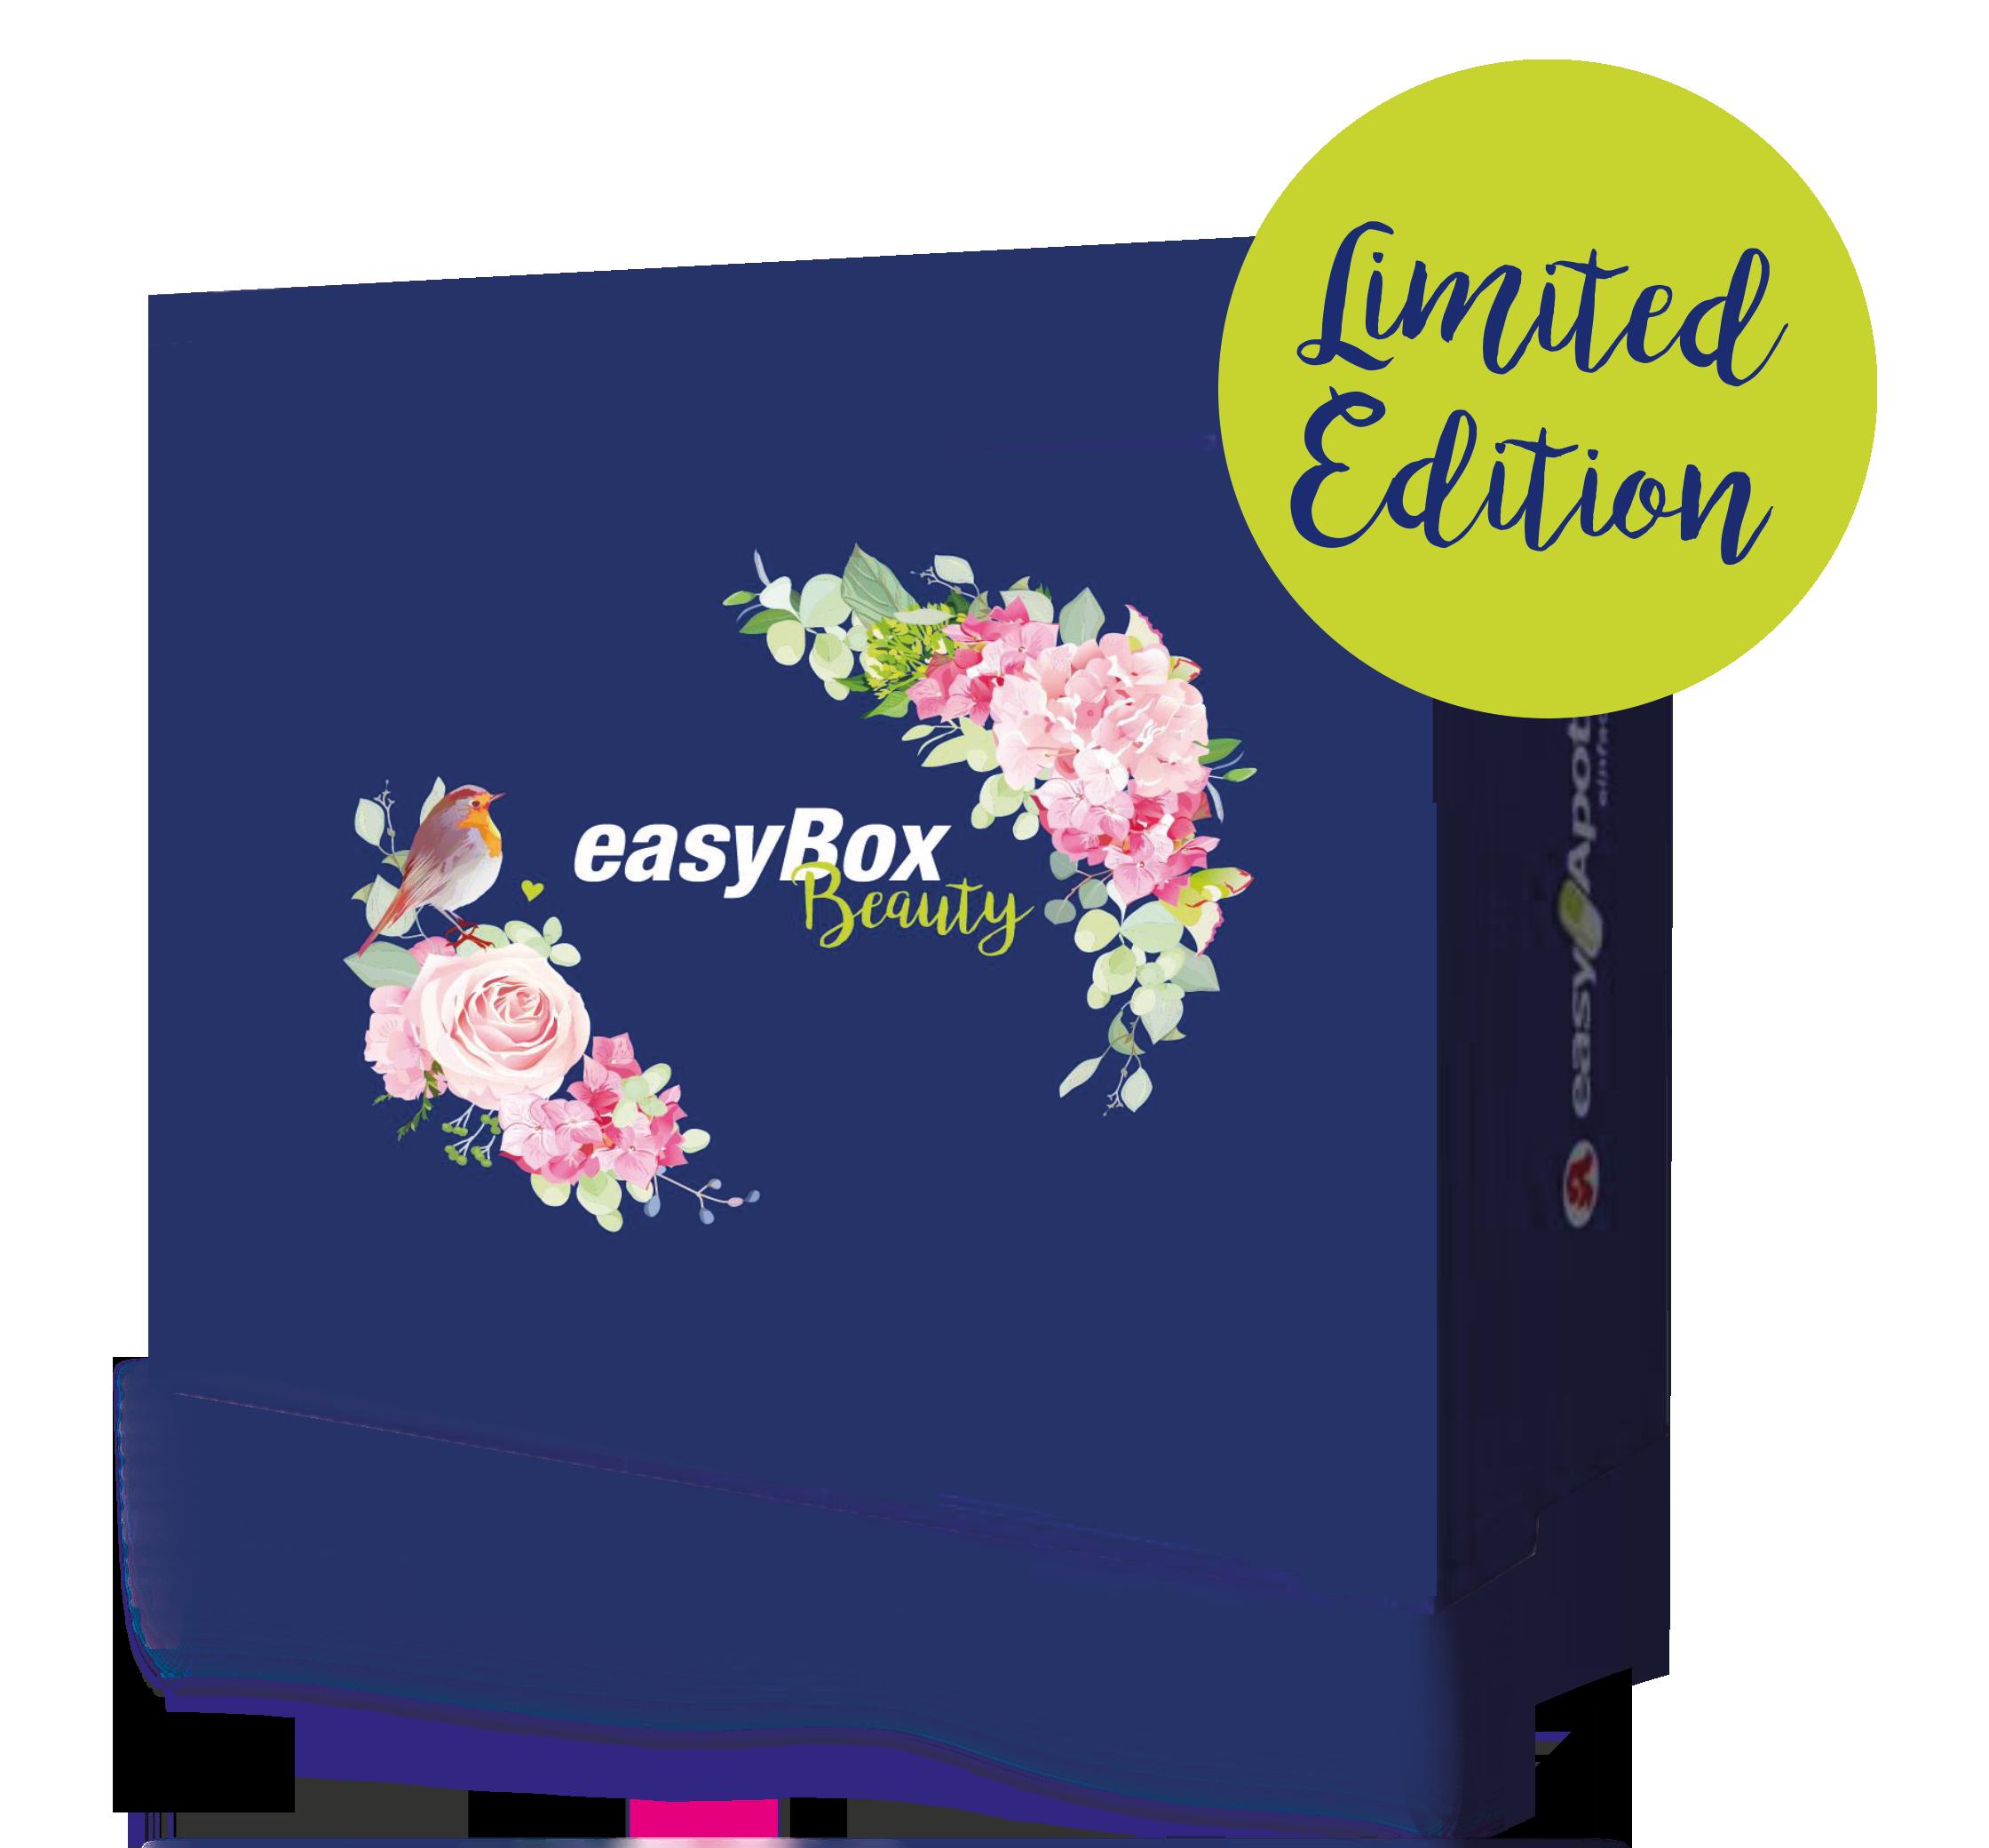 easyBox_02